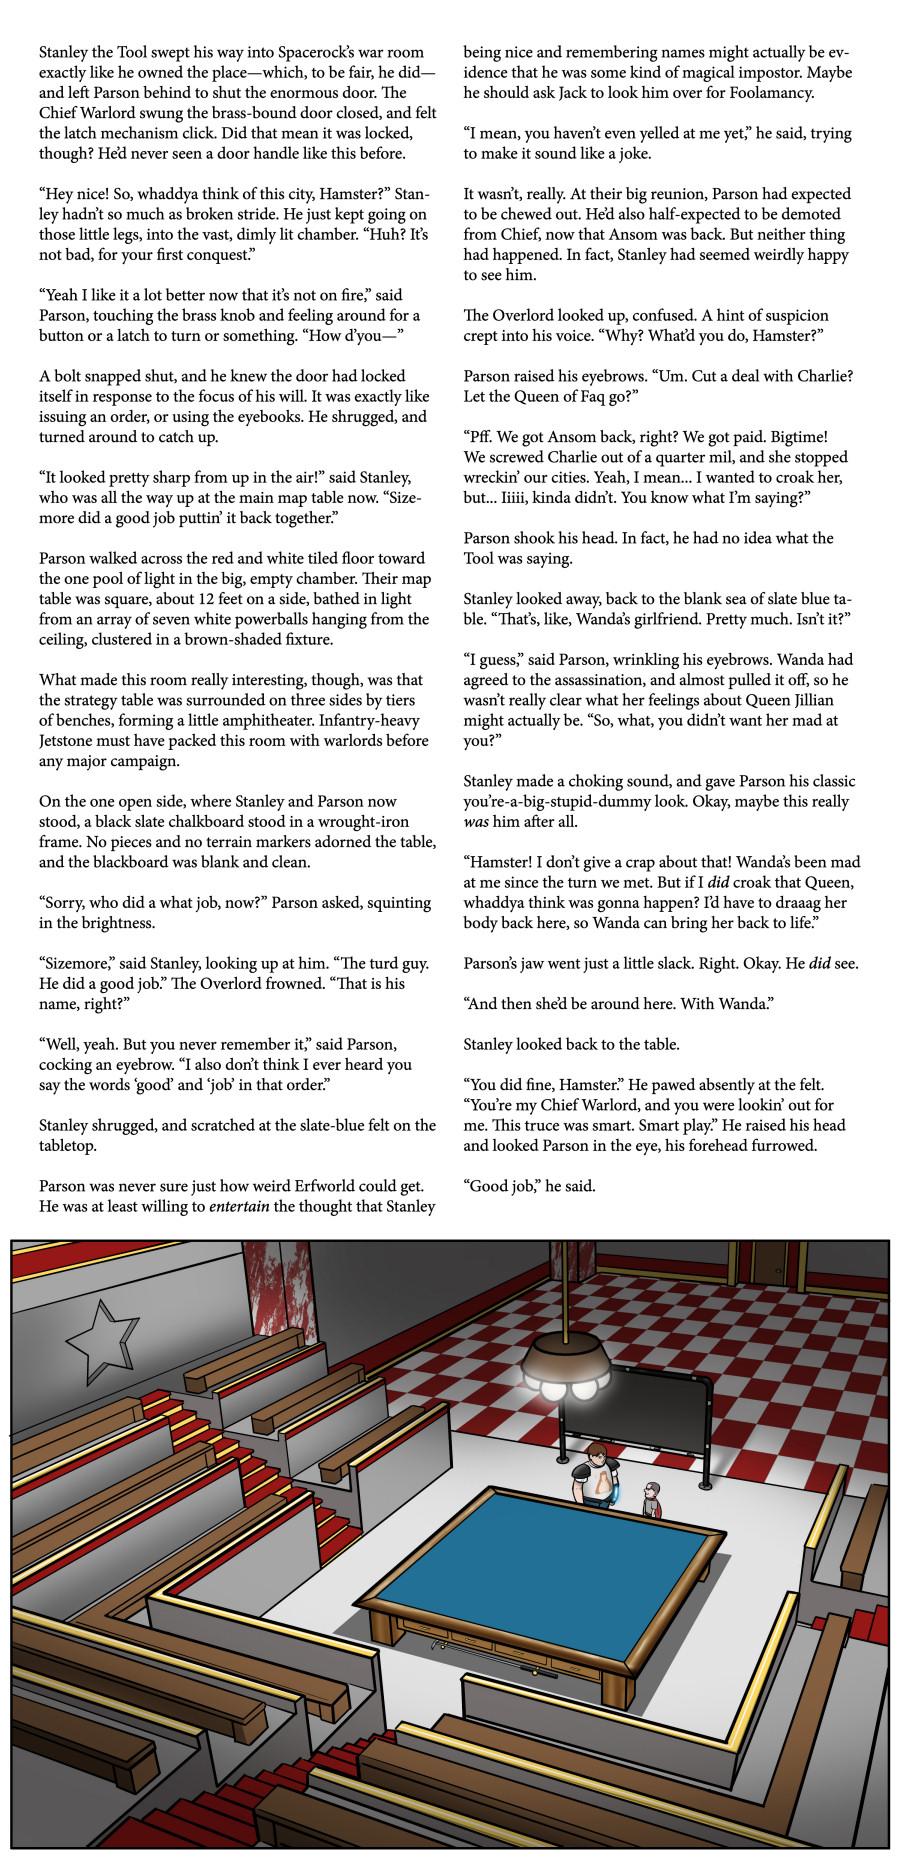 Comic - Book 3 - Page 35